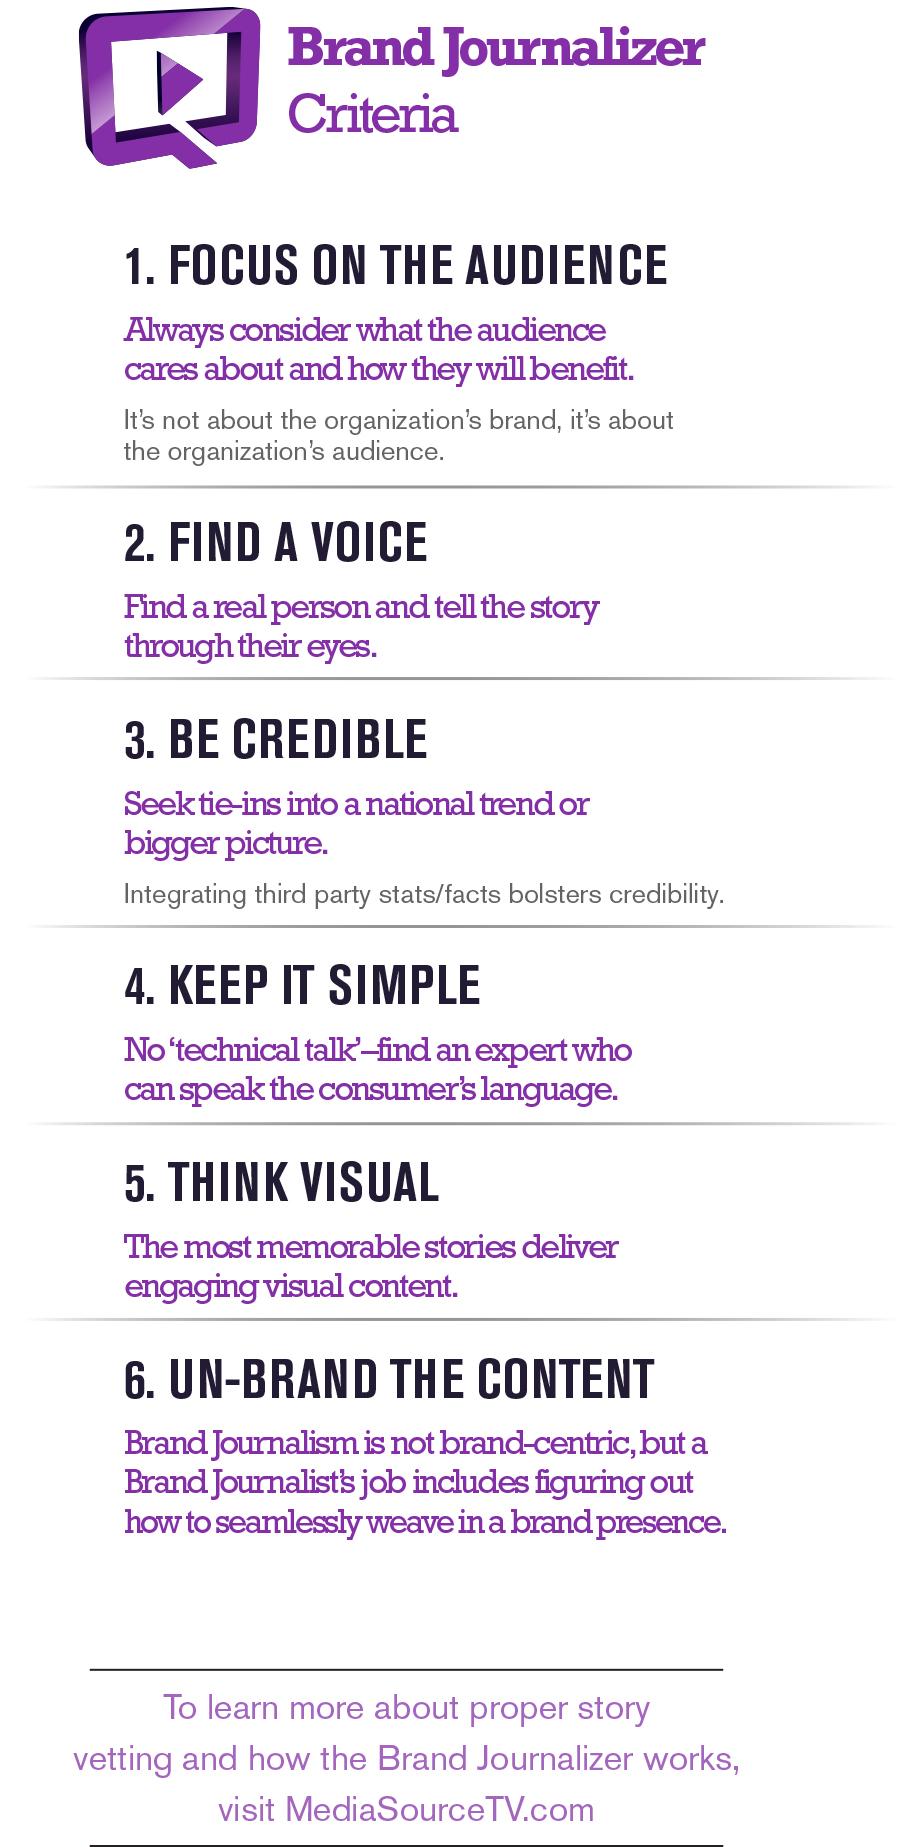 Brand_Journalizer_Criteria (1).jpg